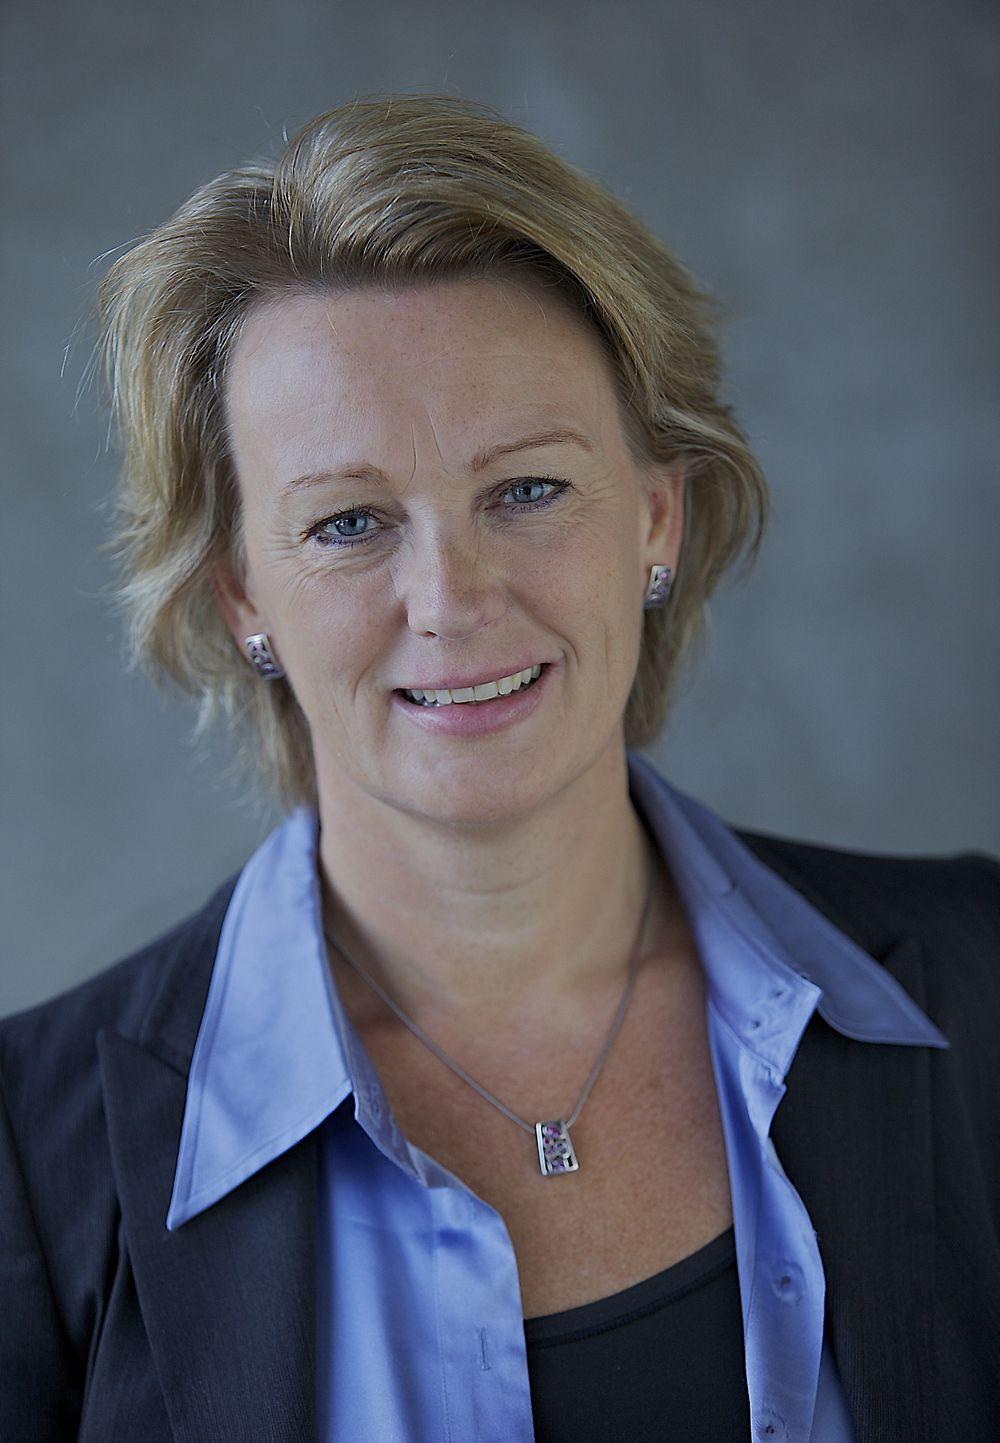 Elisabeth Tørstad er fra januar 2014 konserndirektør med ansvar for DNV GL Oil & Gas med 5.500 ansatte.